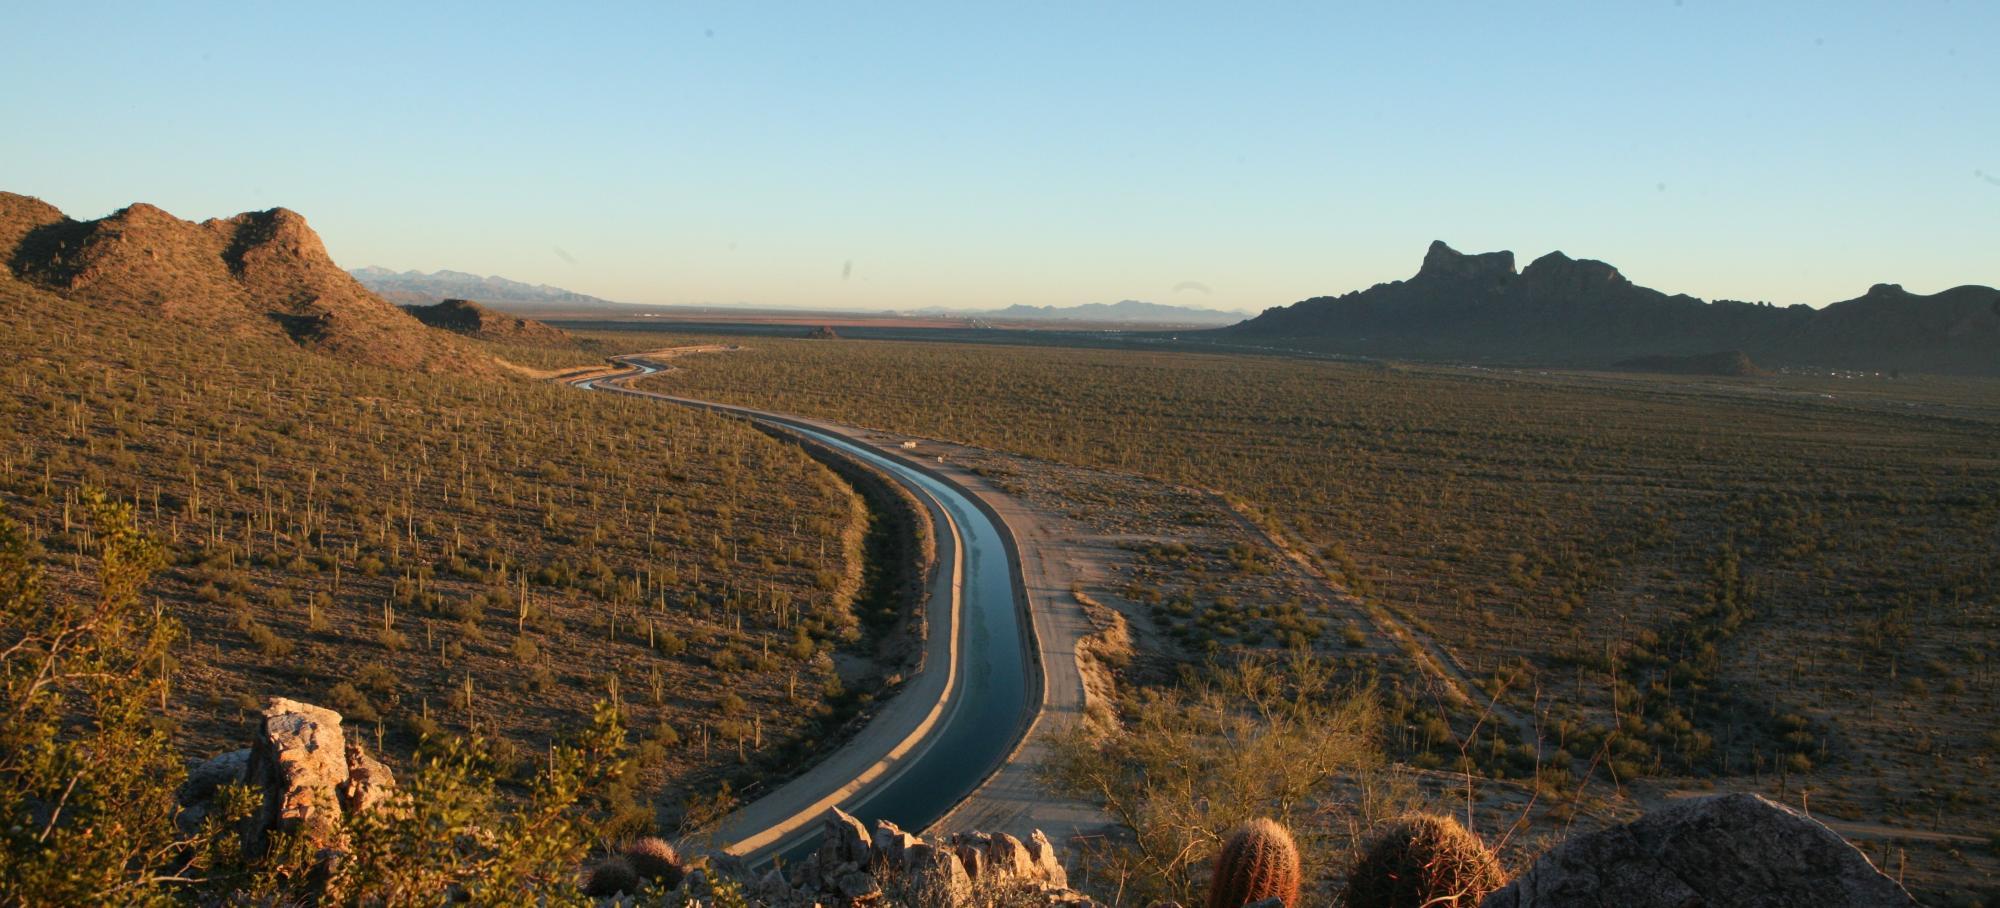 Desert Landscape and River Photo